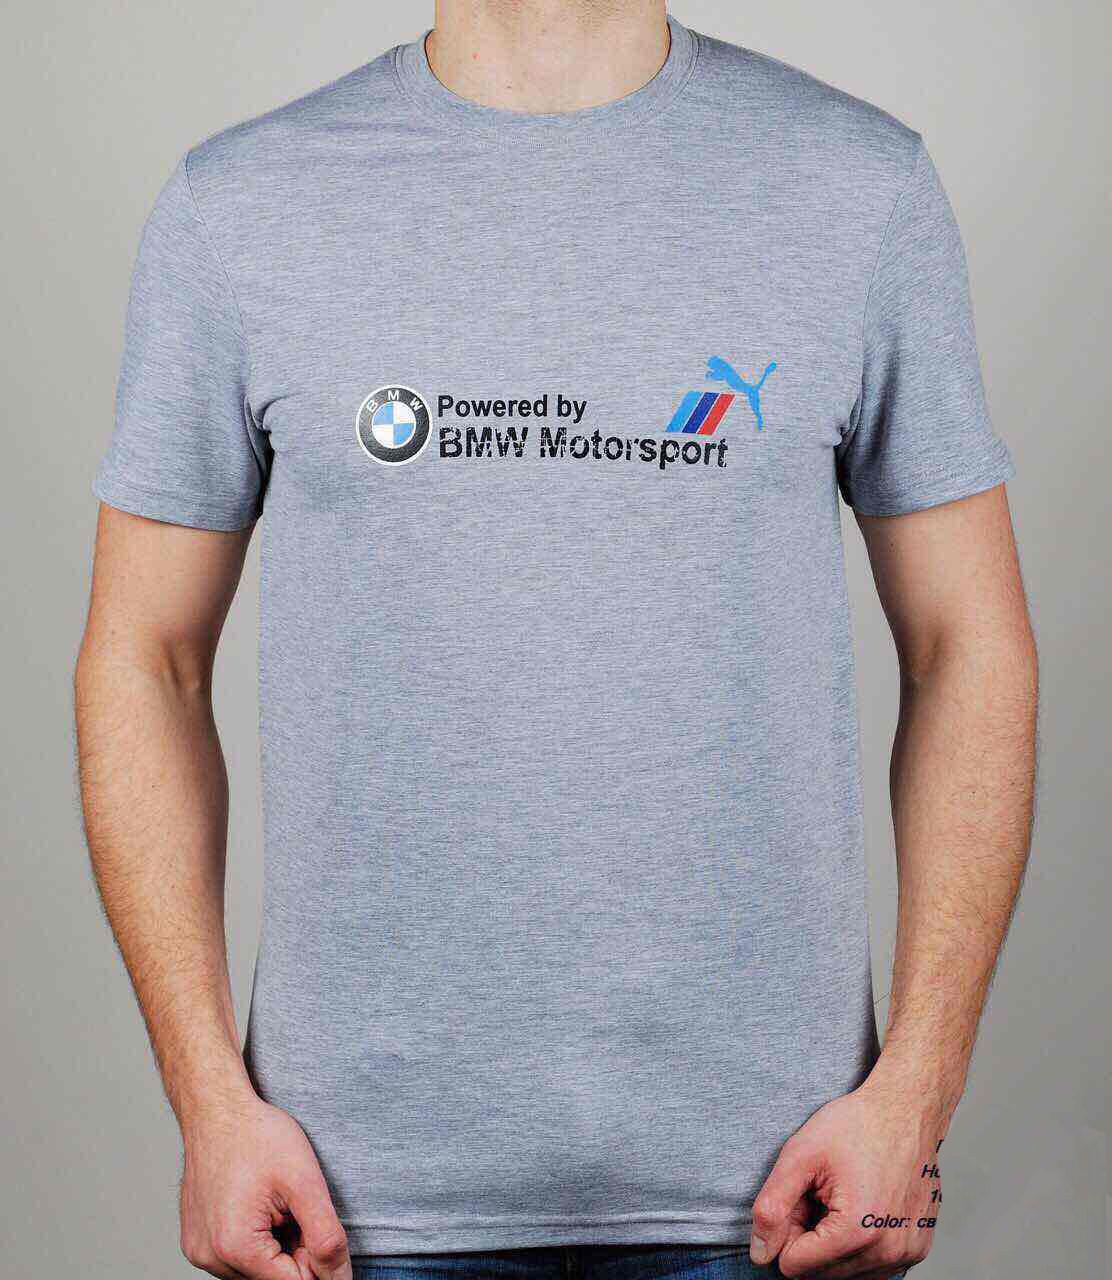 877ee53f6c56a9 Мужская футболка Puma BMW Motorsport - Интернет-магазин zakyt.com -  ЗАКУТКОМ. Доставка